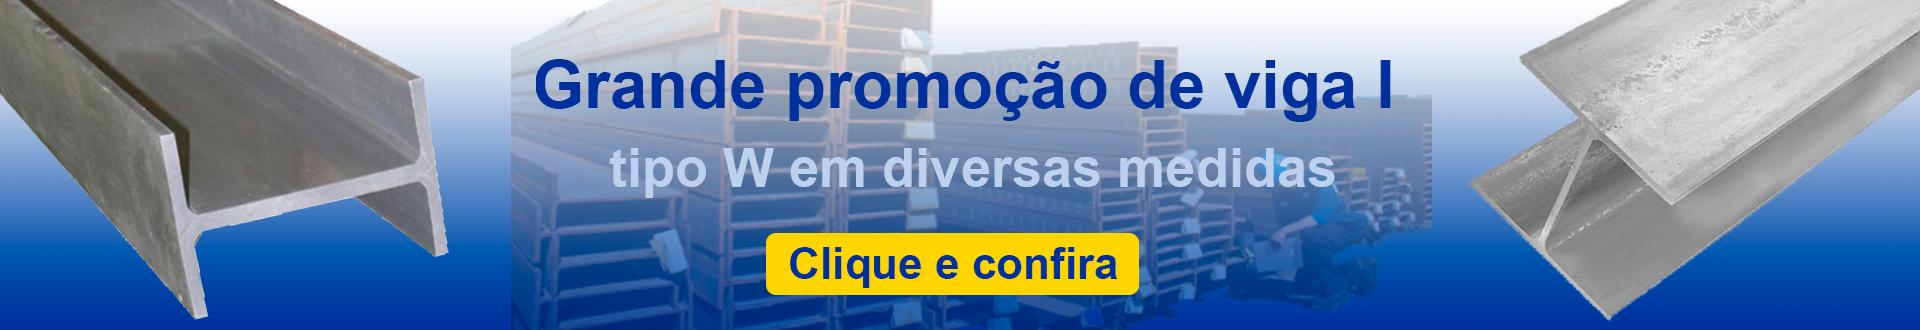 2019-07-02-banner-1920x330-fundo-degrade-azul-campanha-perfil-W